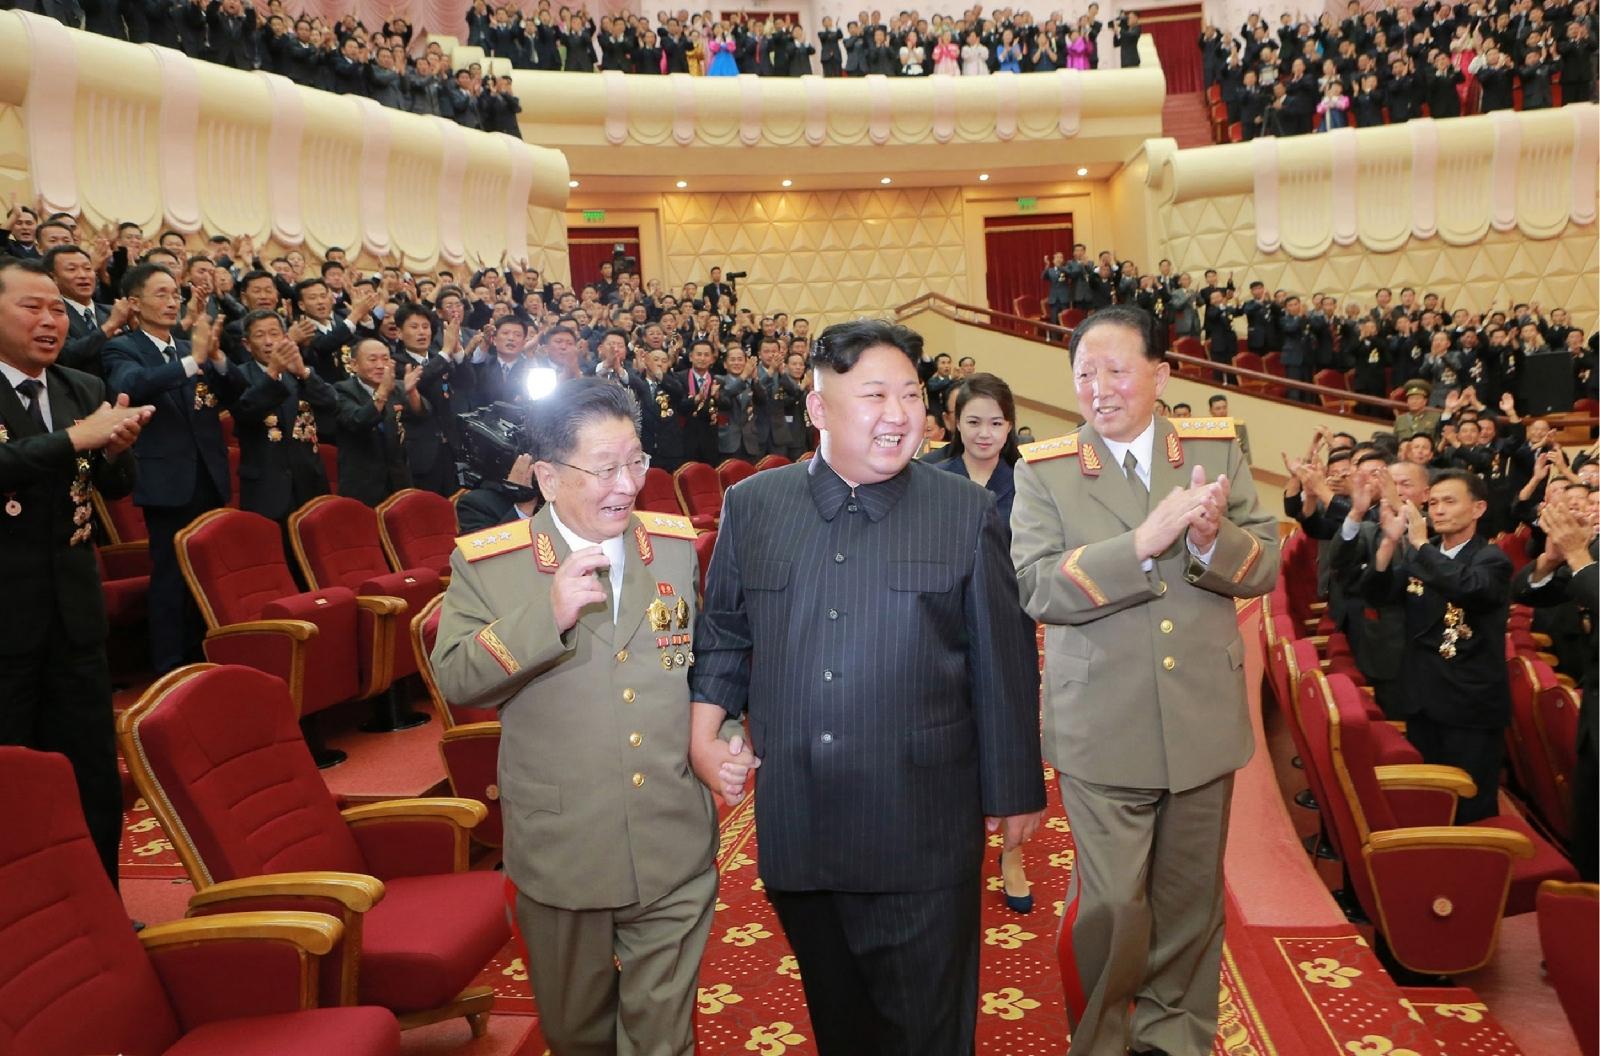 Kim Jong-un nuclear celebration